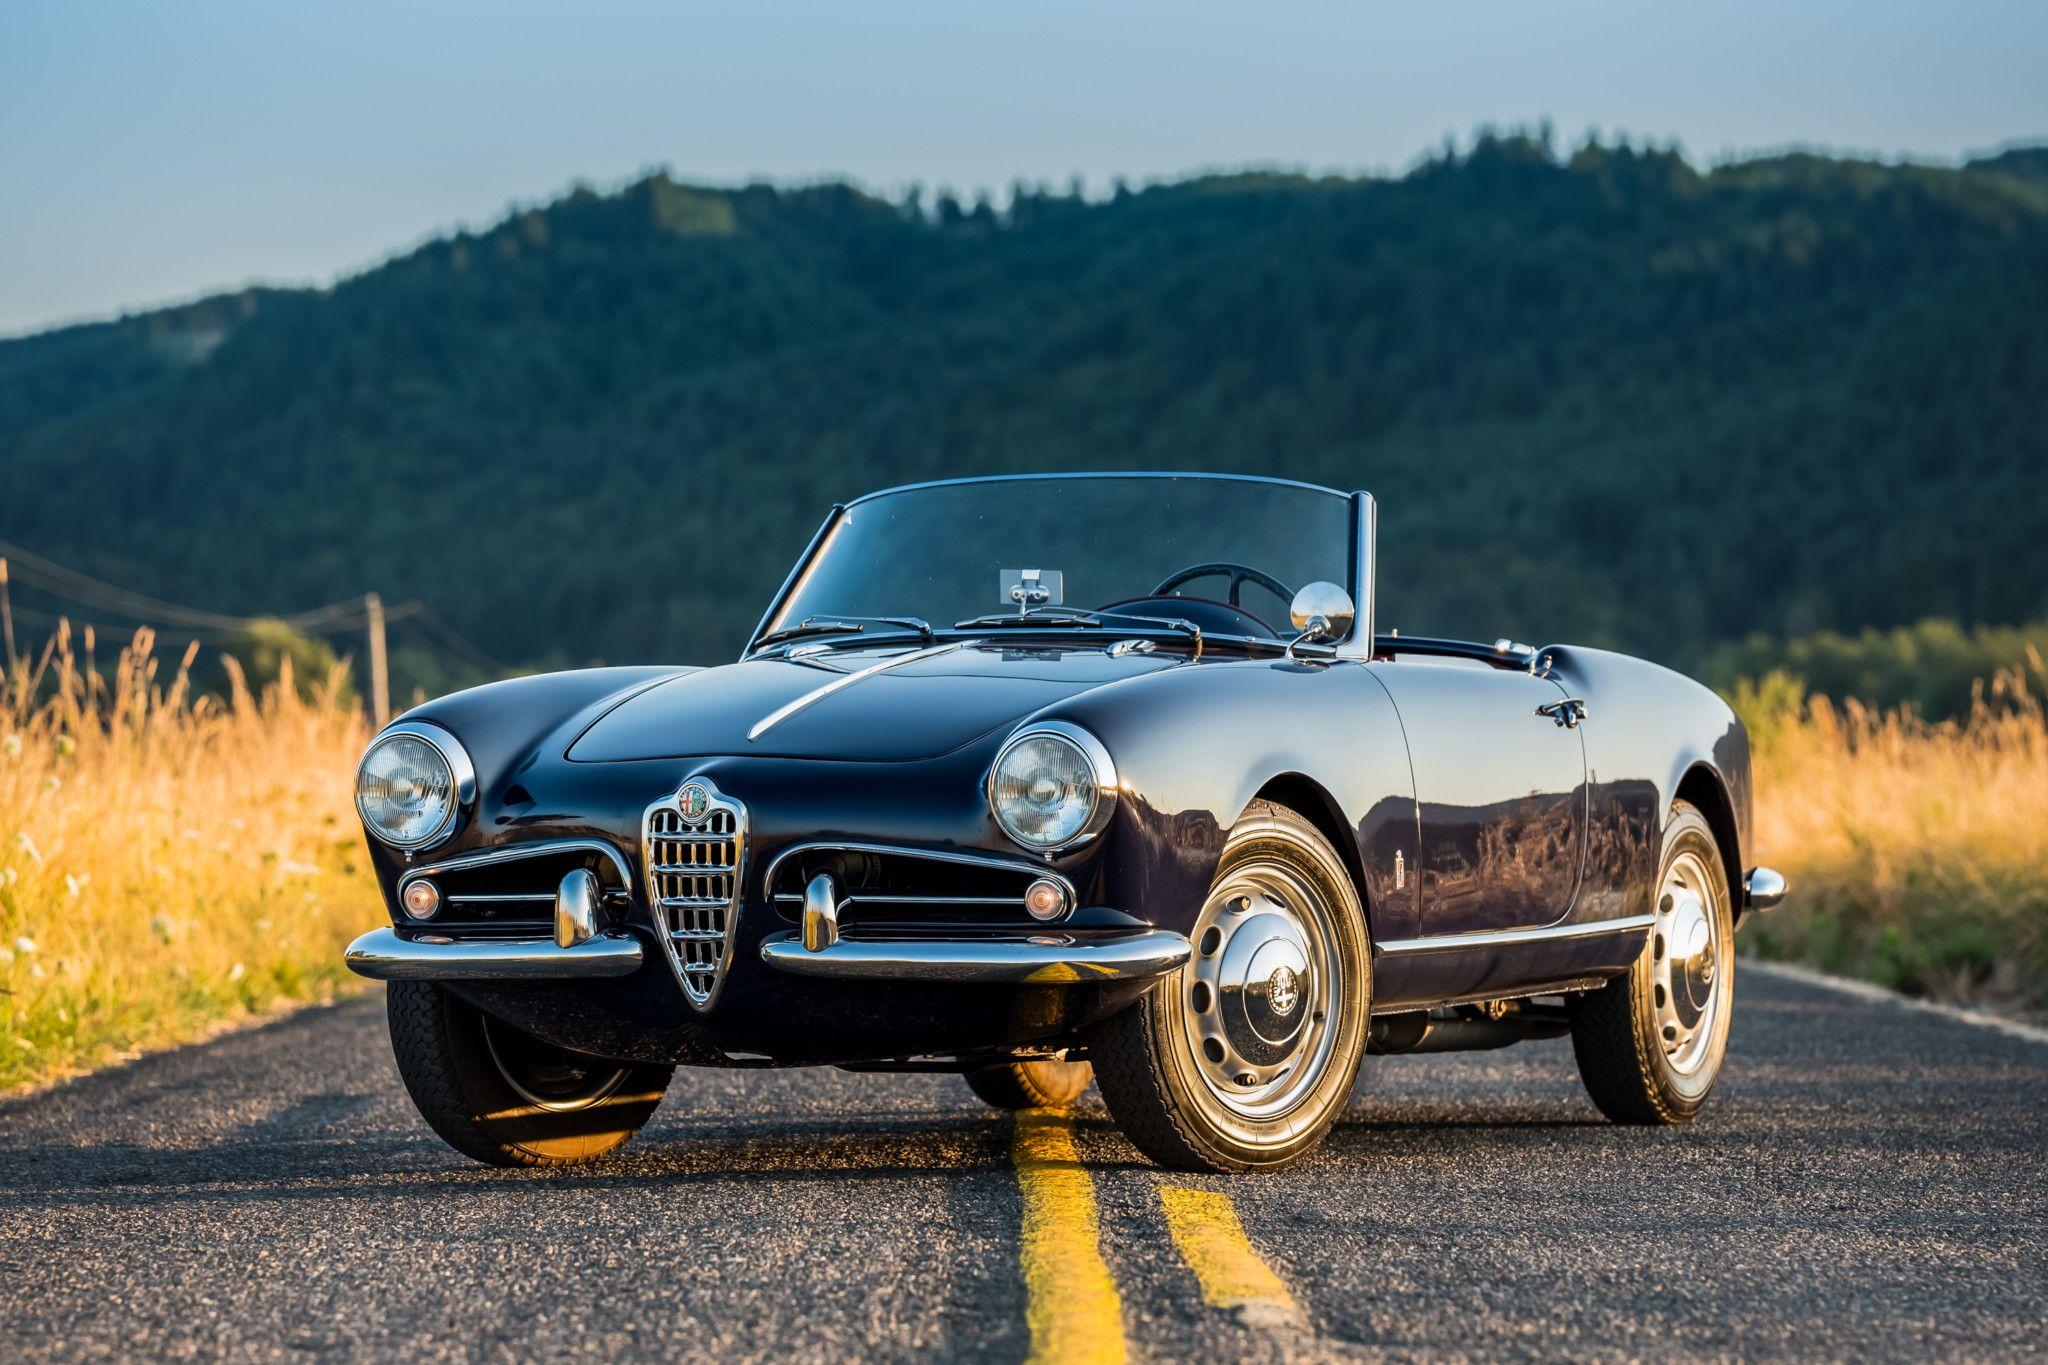 Restored 1956 Alfa Romeo Giulietta Spider Alfa Romeo Giulietta Spider Alfa Romeo Giulietta Alfa Romeo